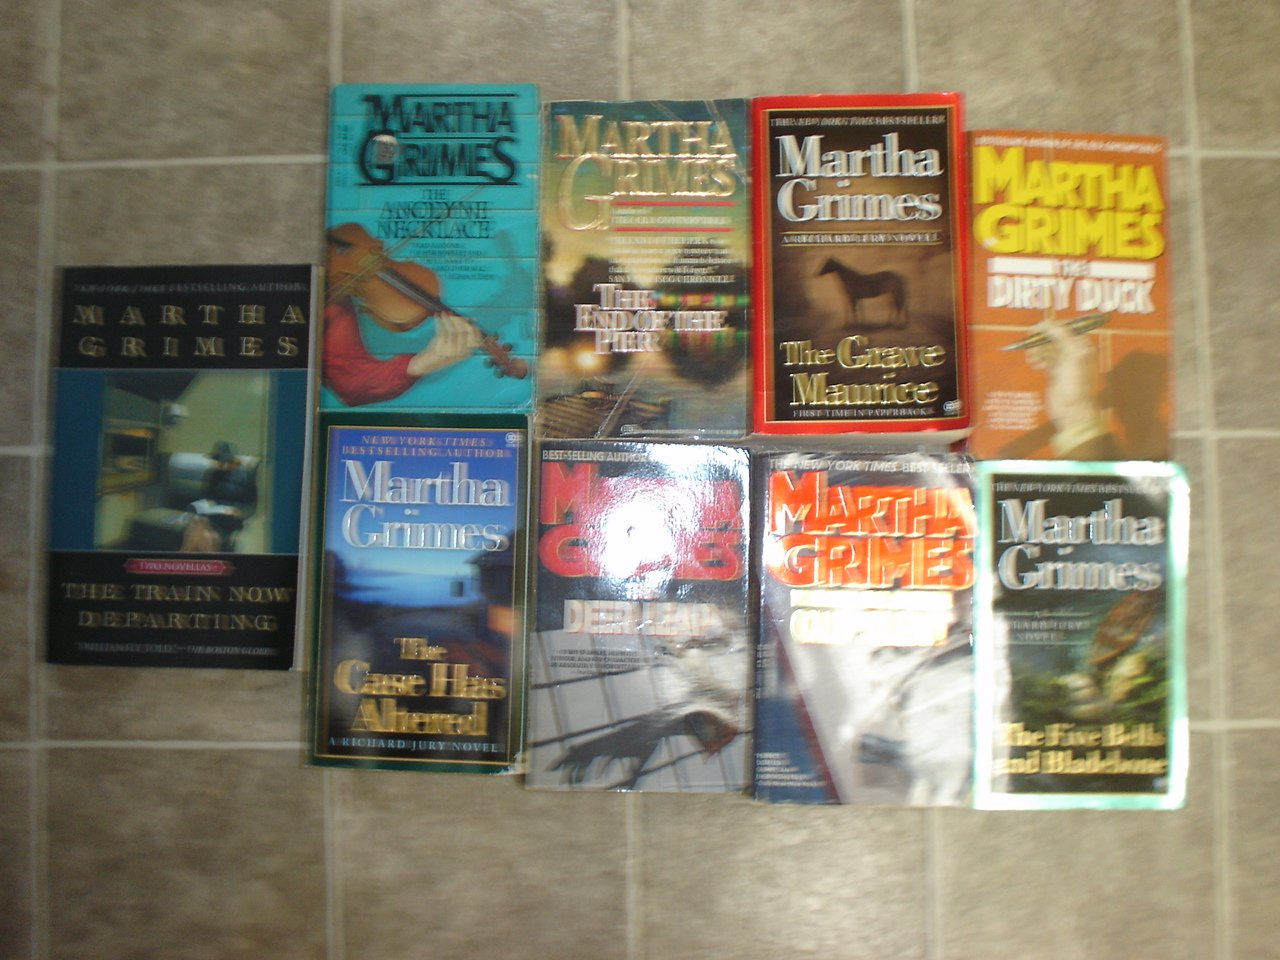 Martha Grimes lot of 9 pb mystery novels books Richard Jury Scotland Yard cozy